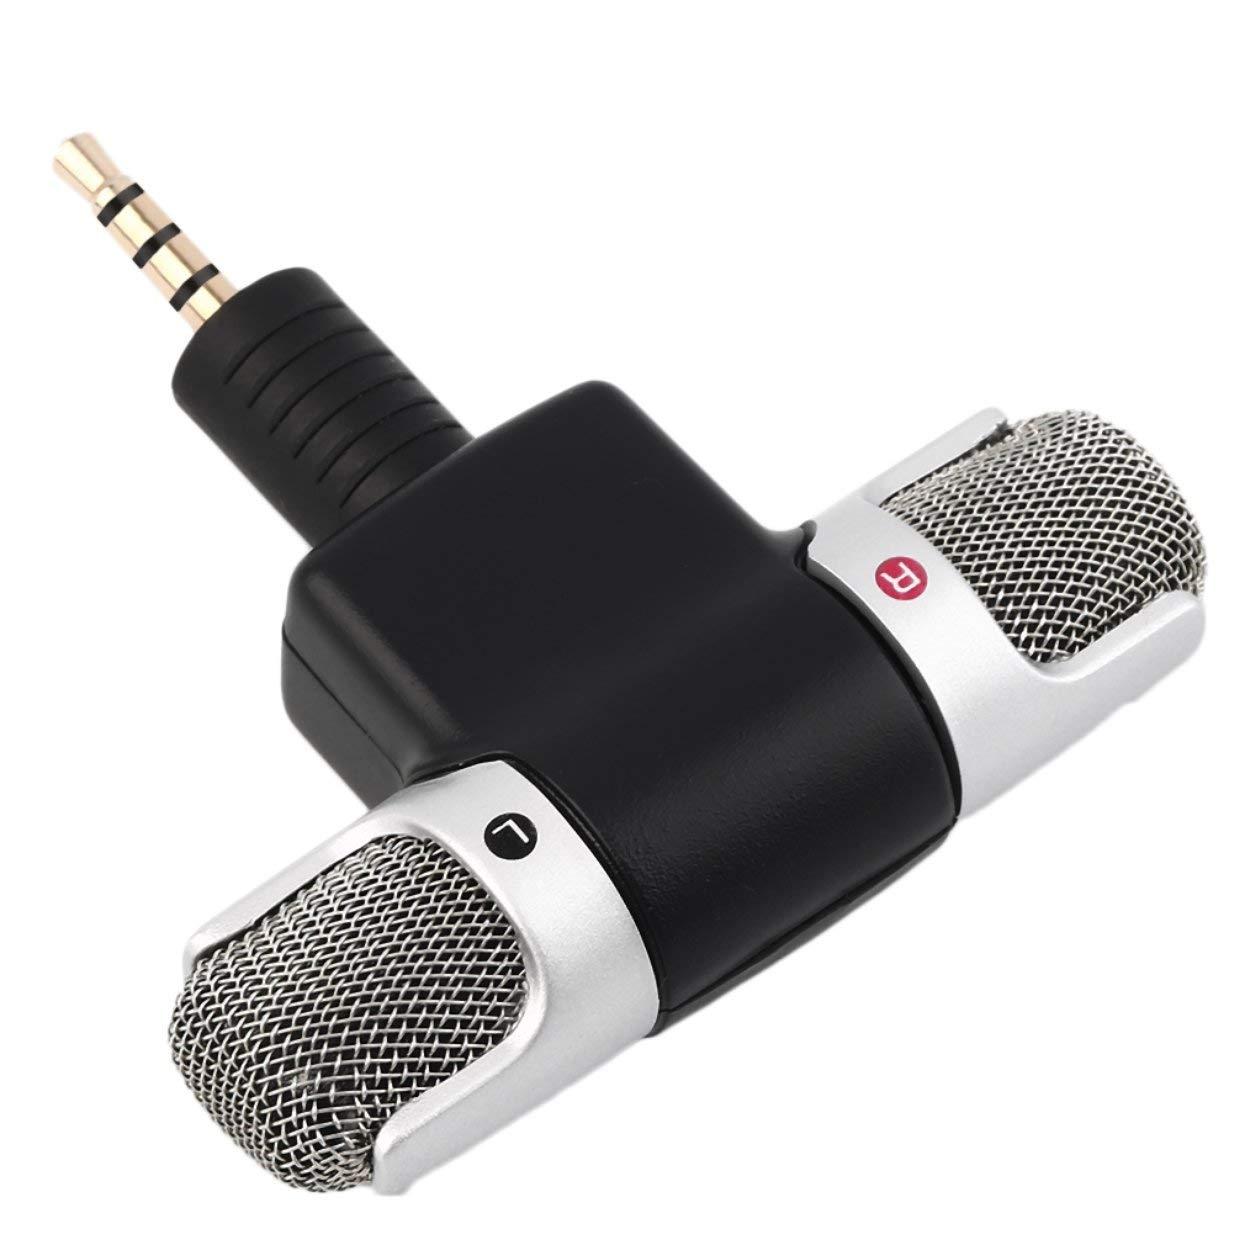 Tree-on-Life Alto Rendimiento de 3,5 mm Jack port/átil Mini Mic Micr/ófono est/éreo Digital para grabadora de tel/éfono m/óvil Cantar canci/ón Karaoke